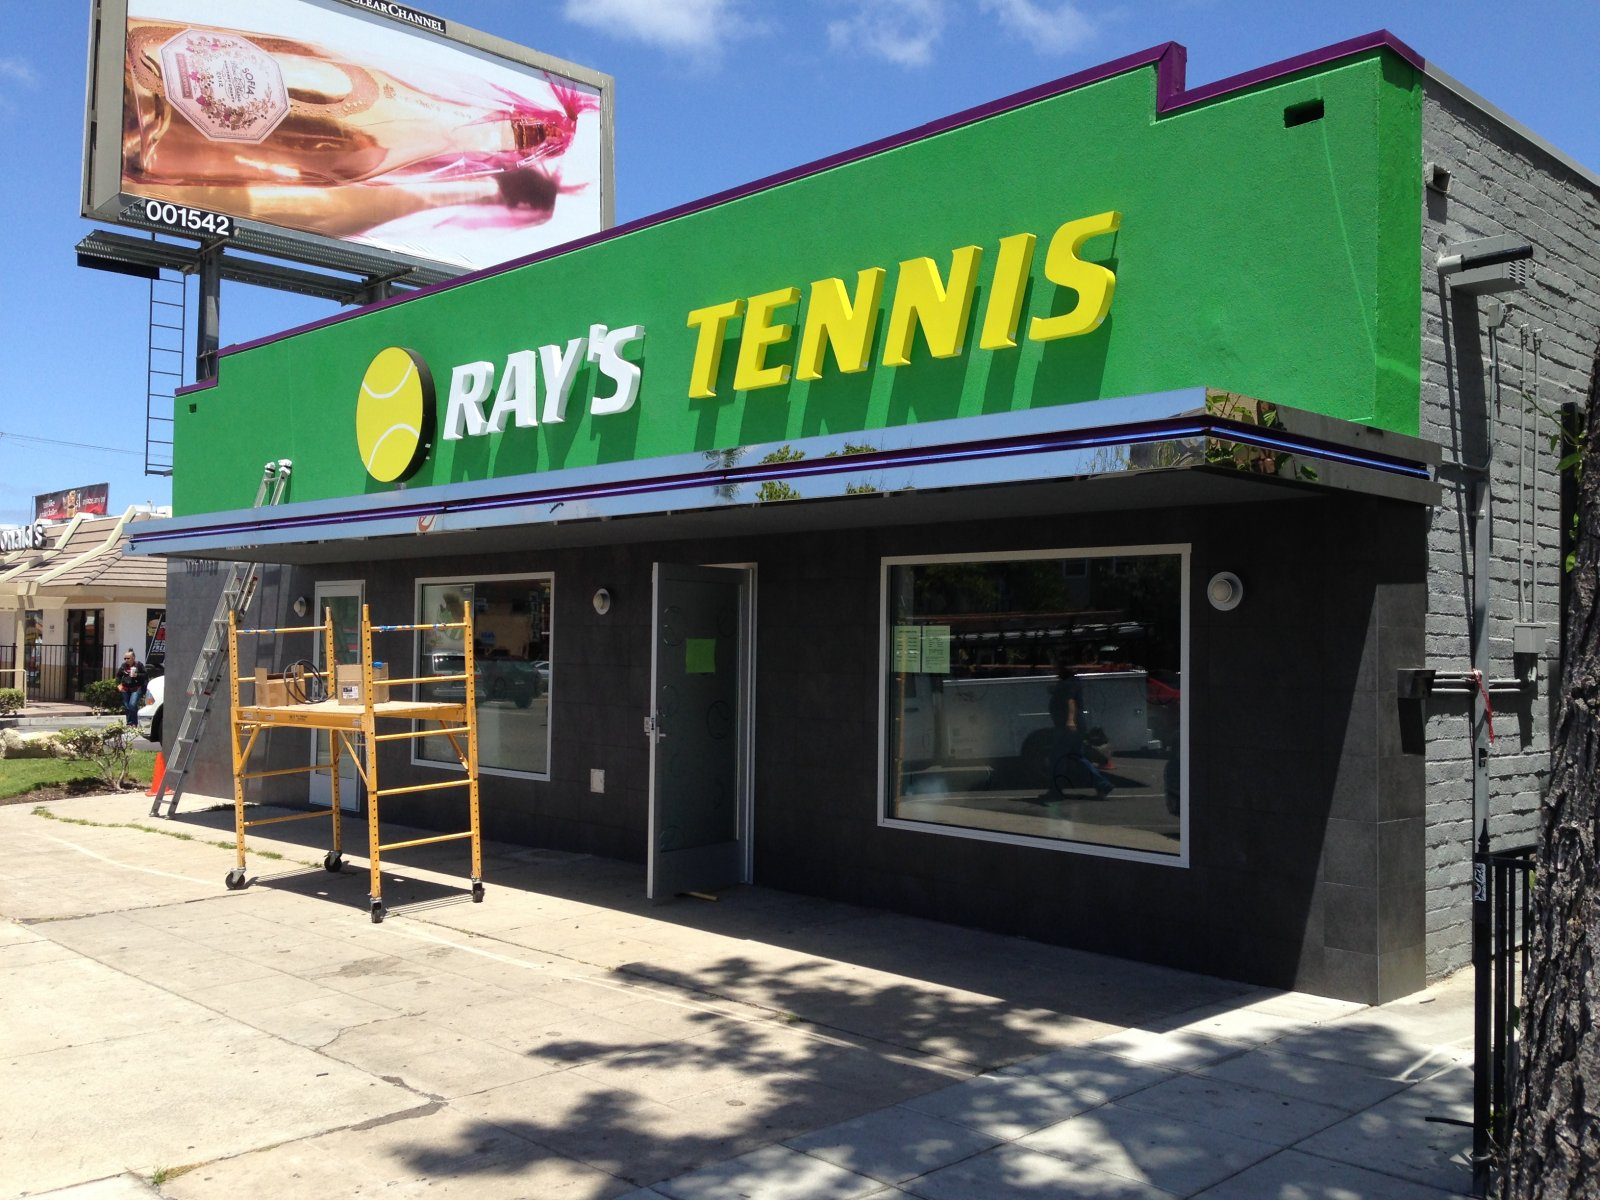 Ray's Tennis - Hillcrest, San Diego